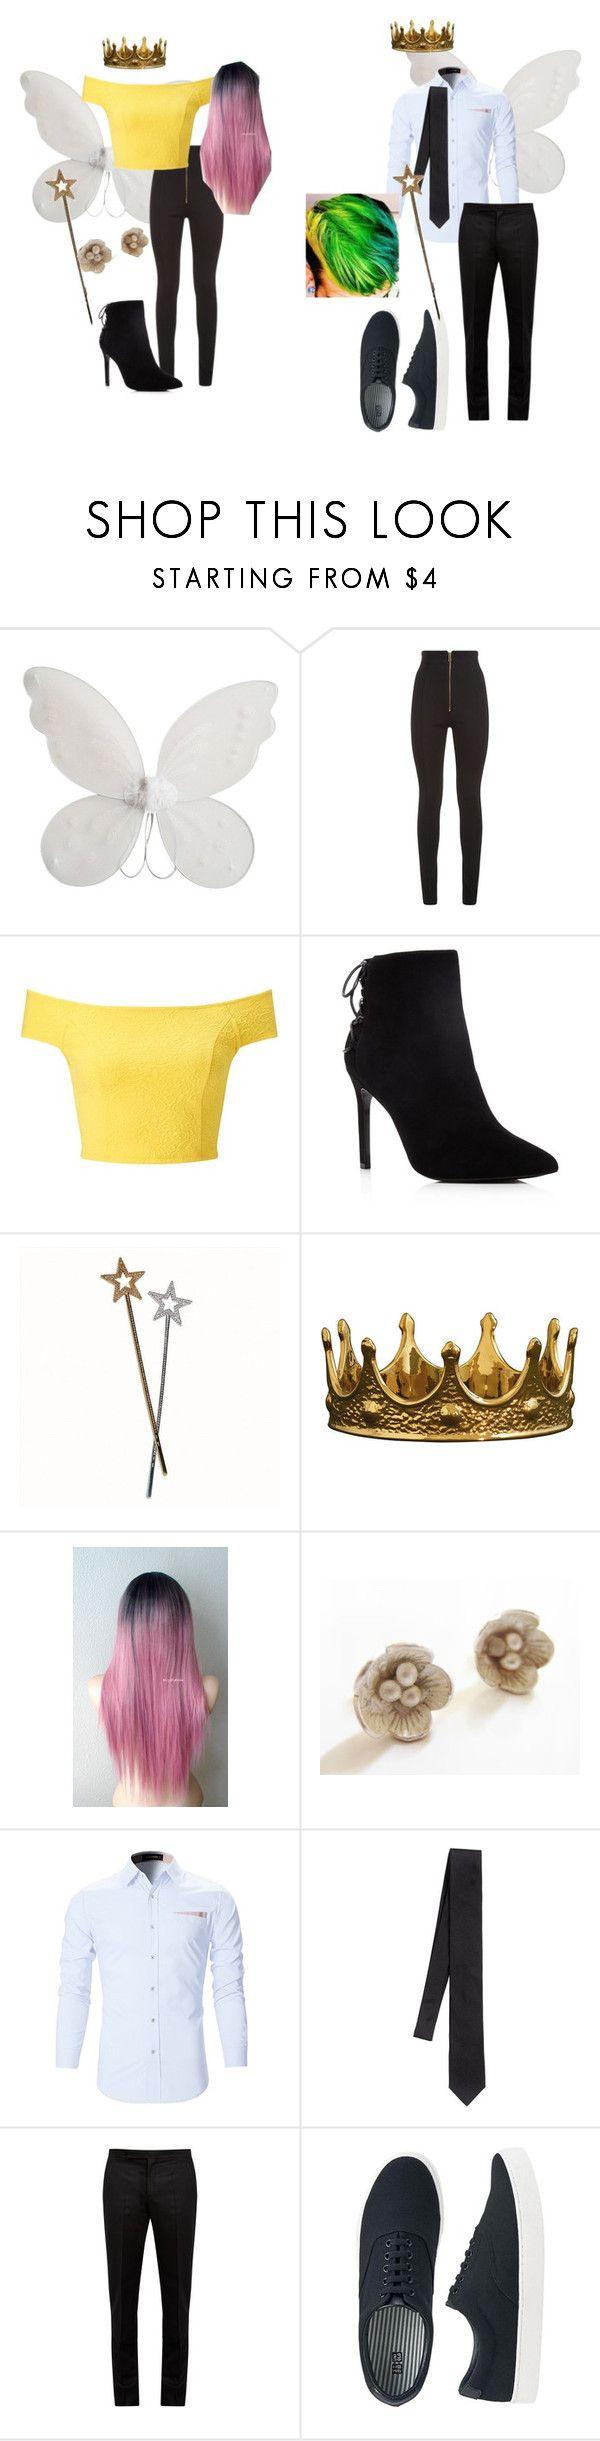 """wanda and cosmo costume"" by meltat20 ❤ liked on Polyvore featuring Balmain, Miss Selfridge, Charles David, Seletti, Catherine Marche, Dolce&Gabbana, Maison Margiela and Uniqlo"